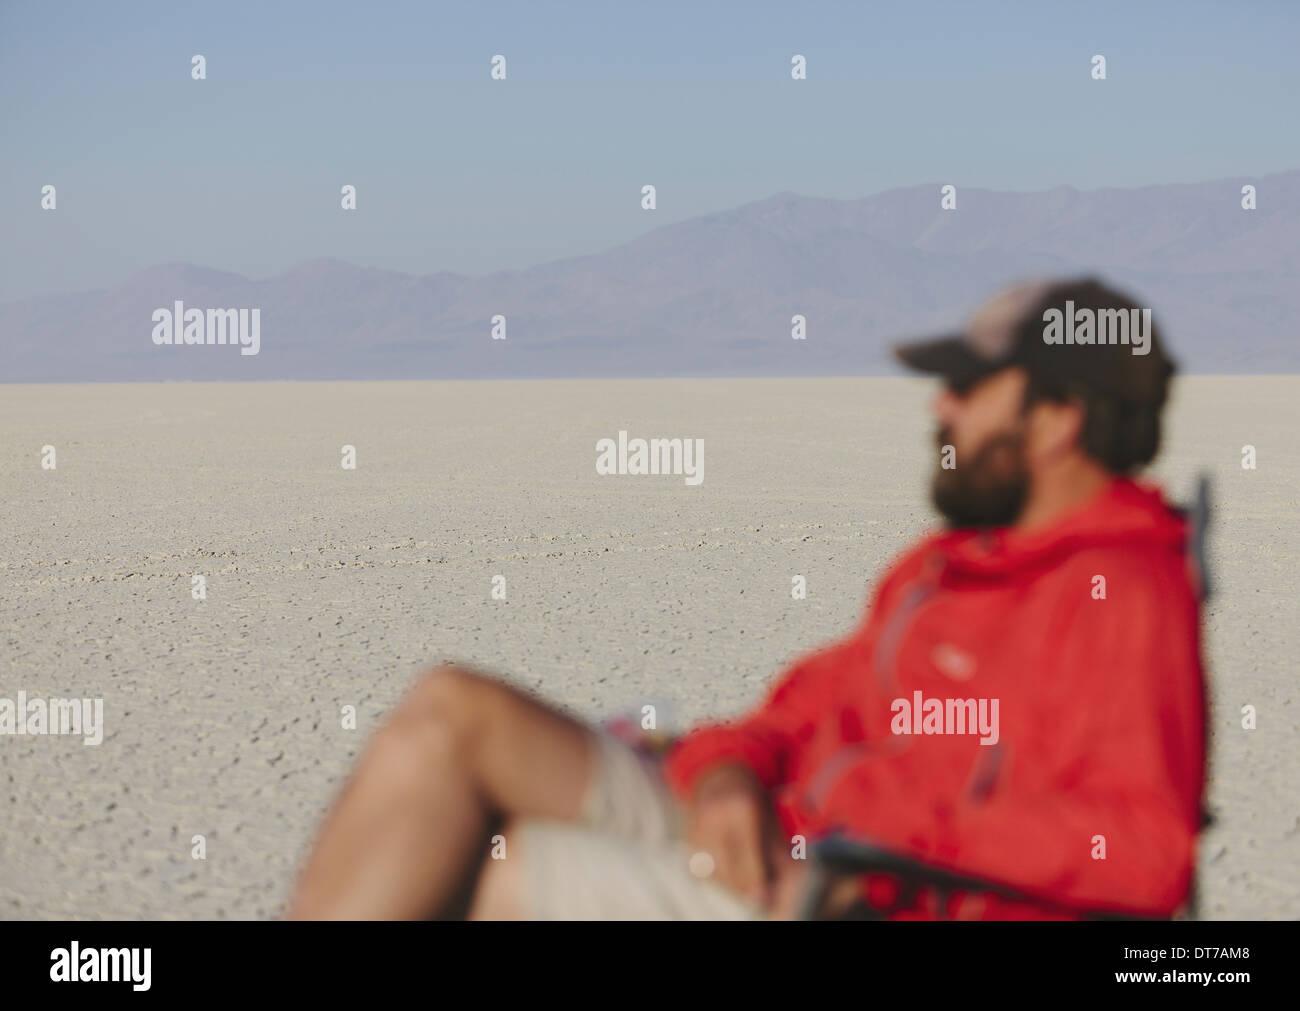 Man sitting in chair in vast barren desert blurred focus Black Rock Desert Pershing County Nevada USA USA - Stock Image